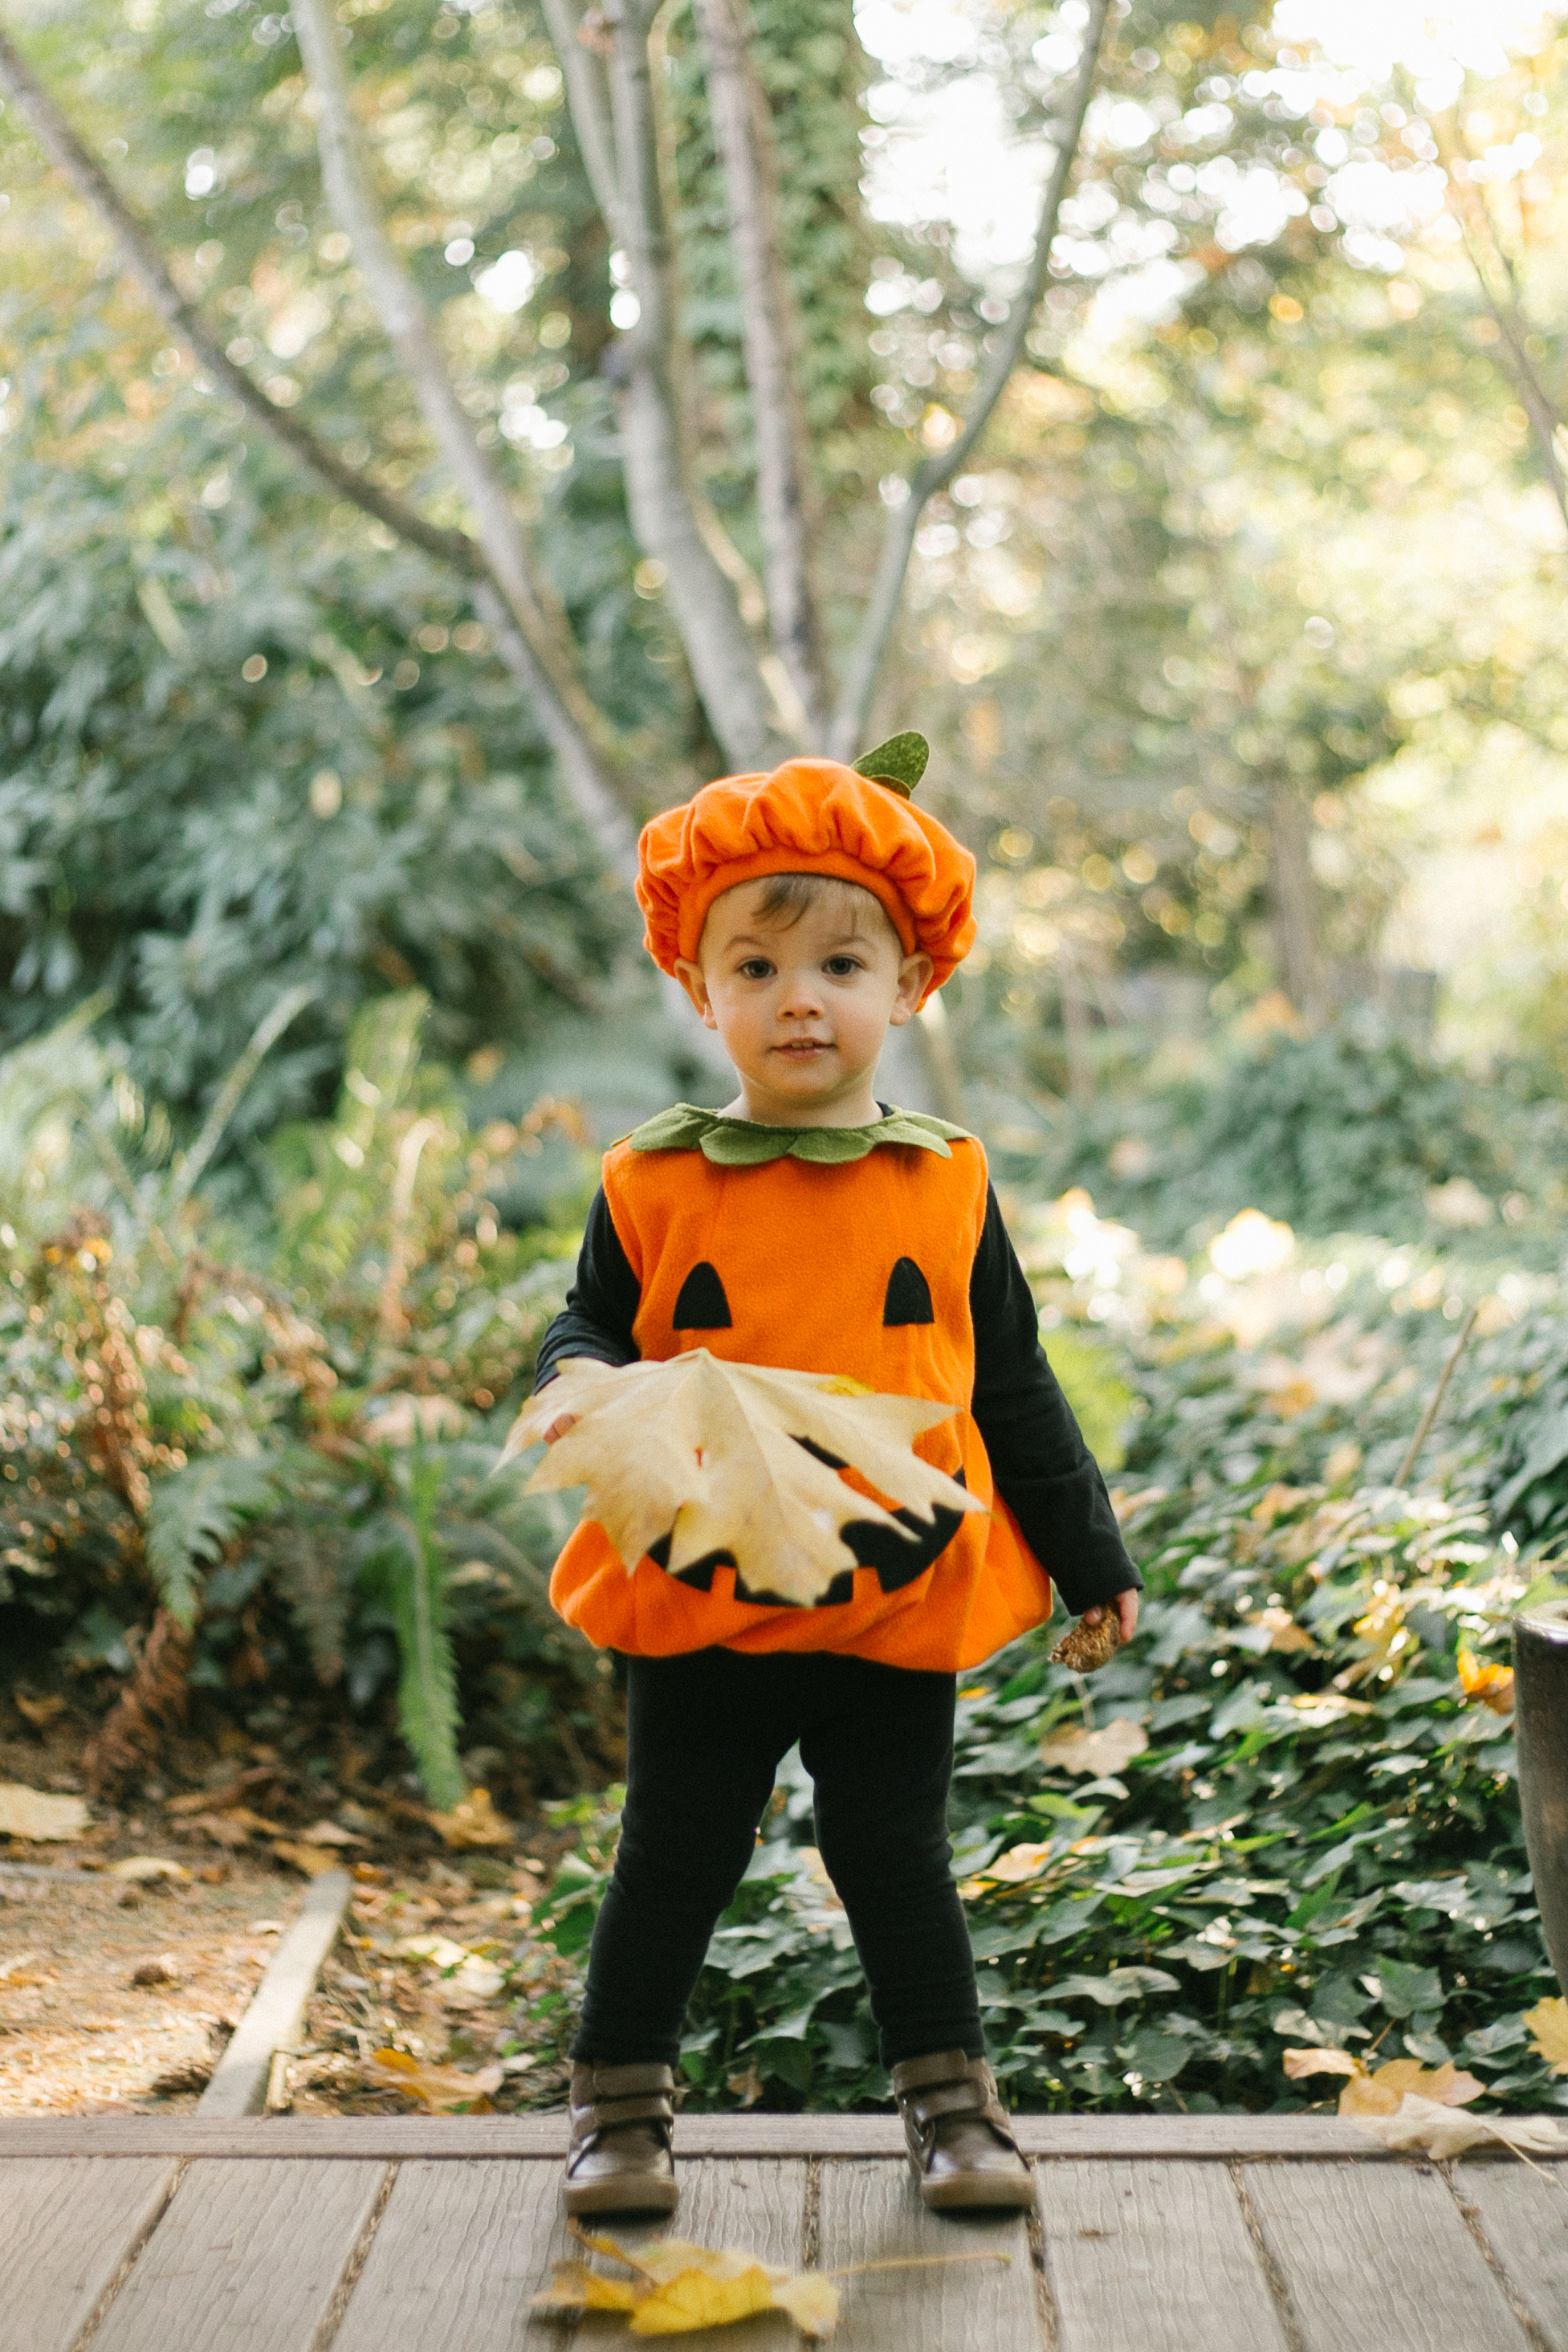 Halloween Kid Portraits at Home | Chelsea Macor Photography-9.jpg